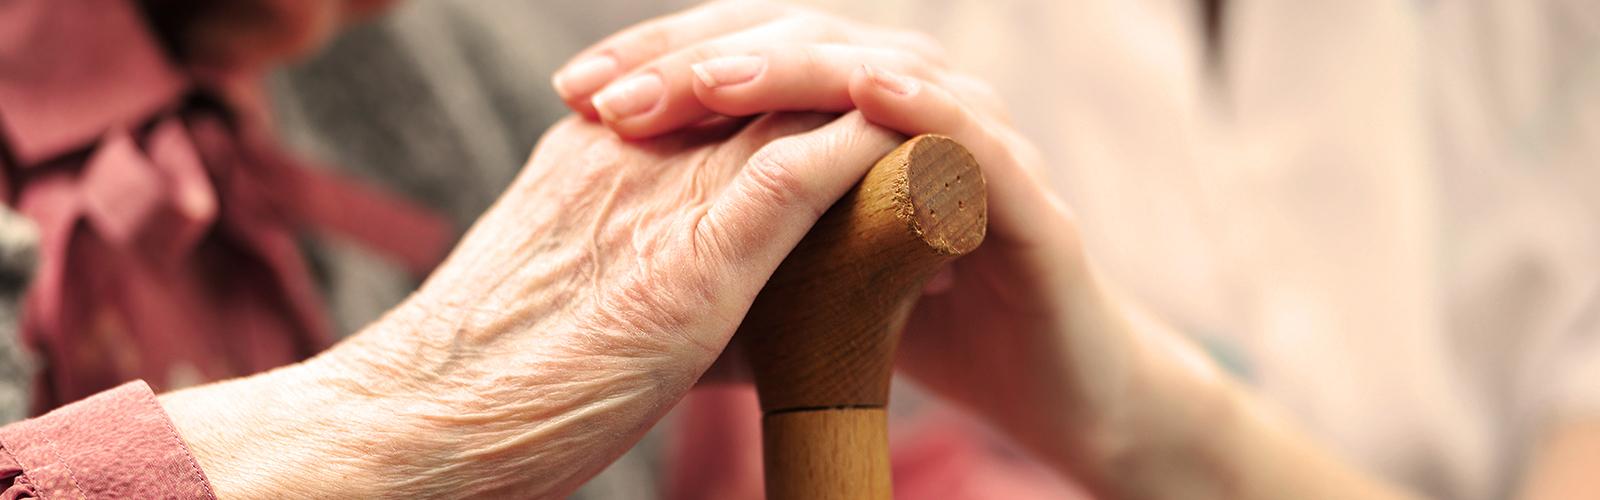 Starija i mlađa žena drže se za ruke – traženje podrške od lokalnih organizacija i dobrotvornih ustanova